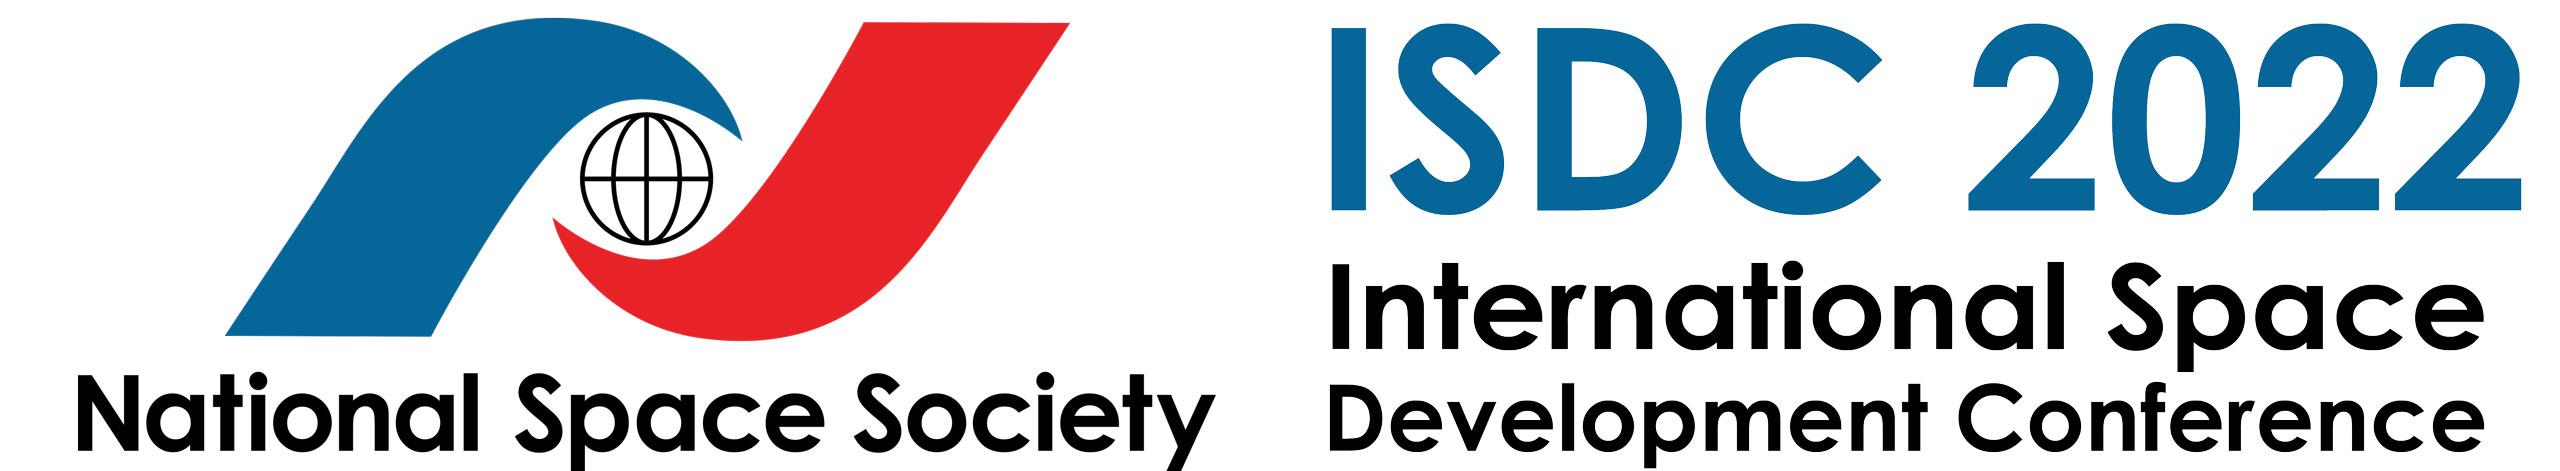 International Space Development Conference 2022